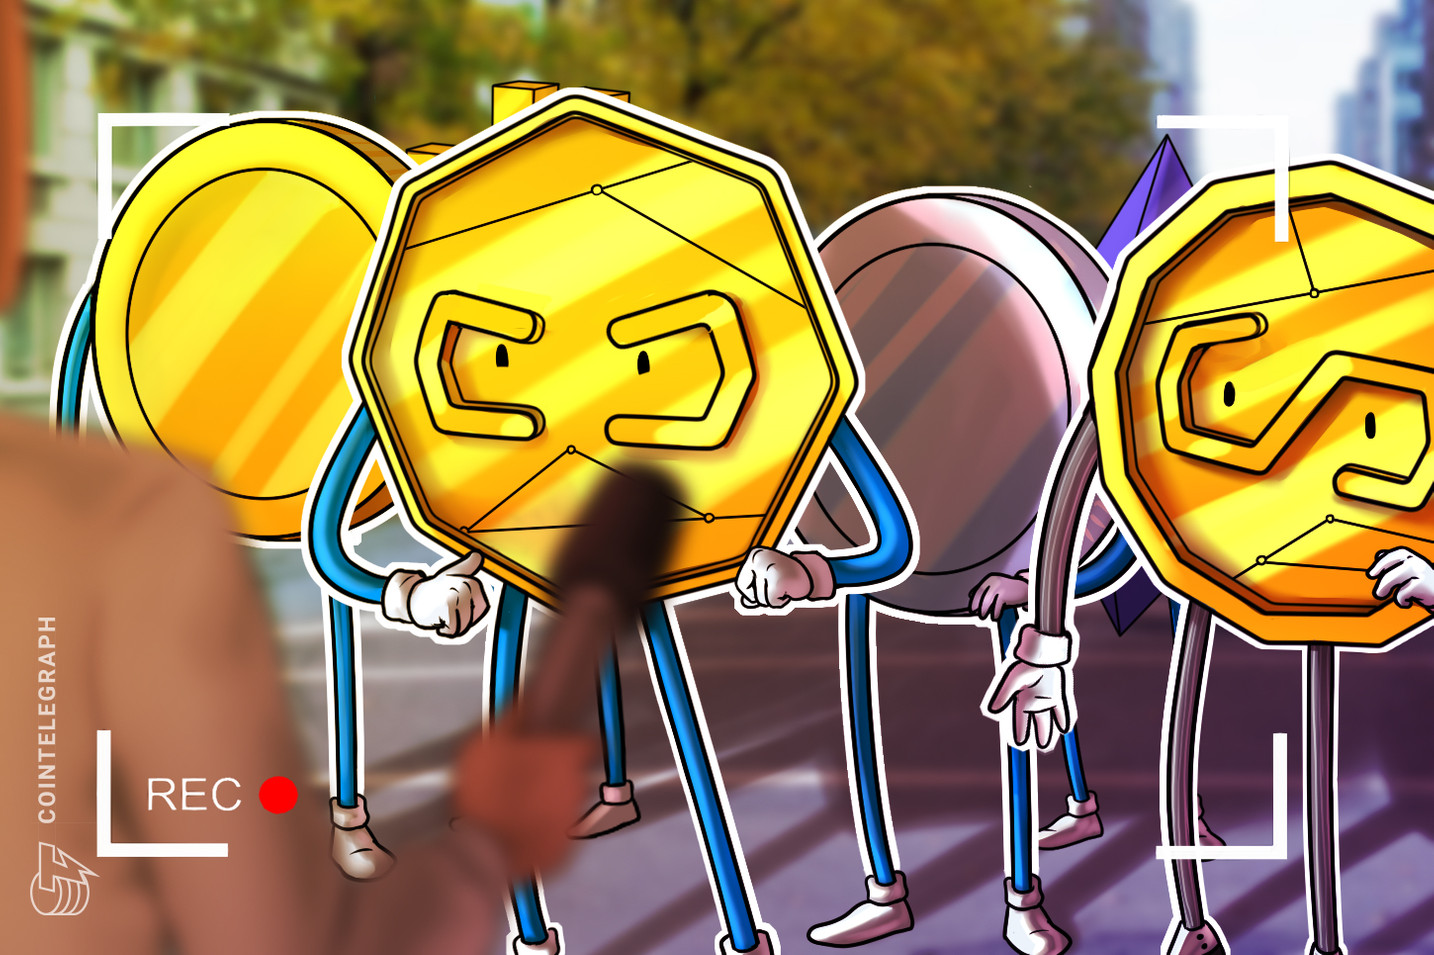 Botón para deshacer envíos de Bitcoin y empresas huyendo: Malas noticias sobre las criptomonedas esta semana